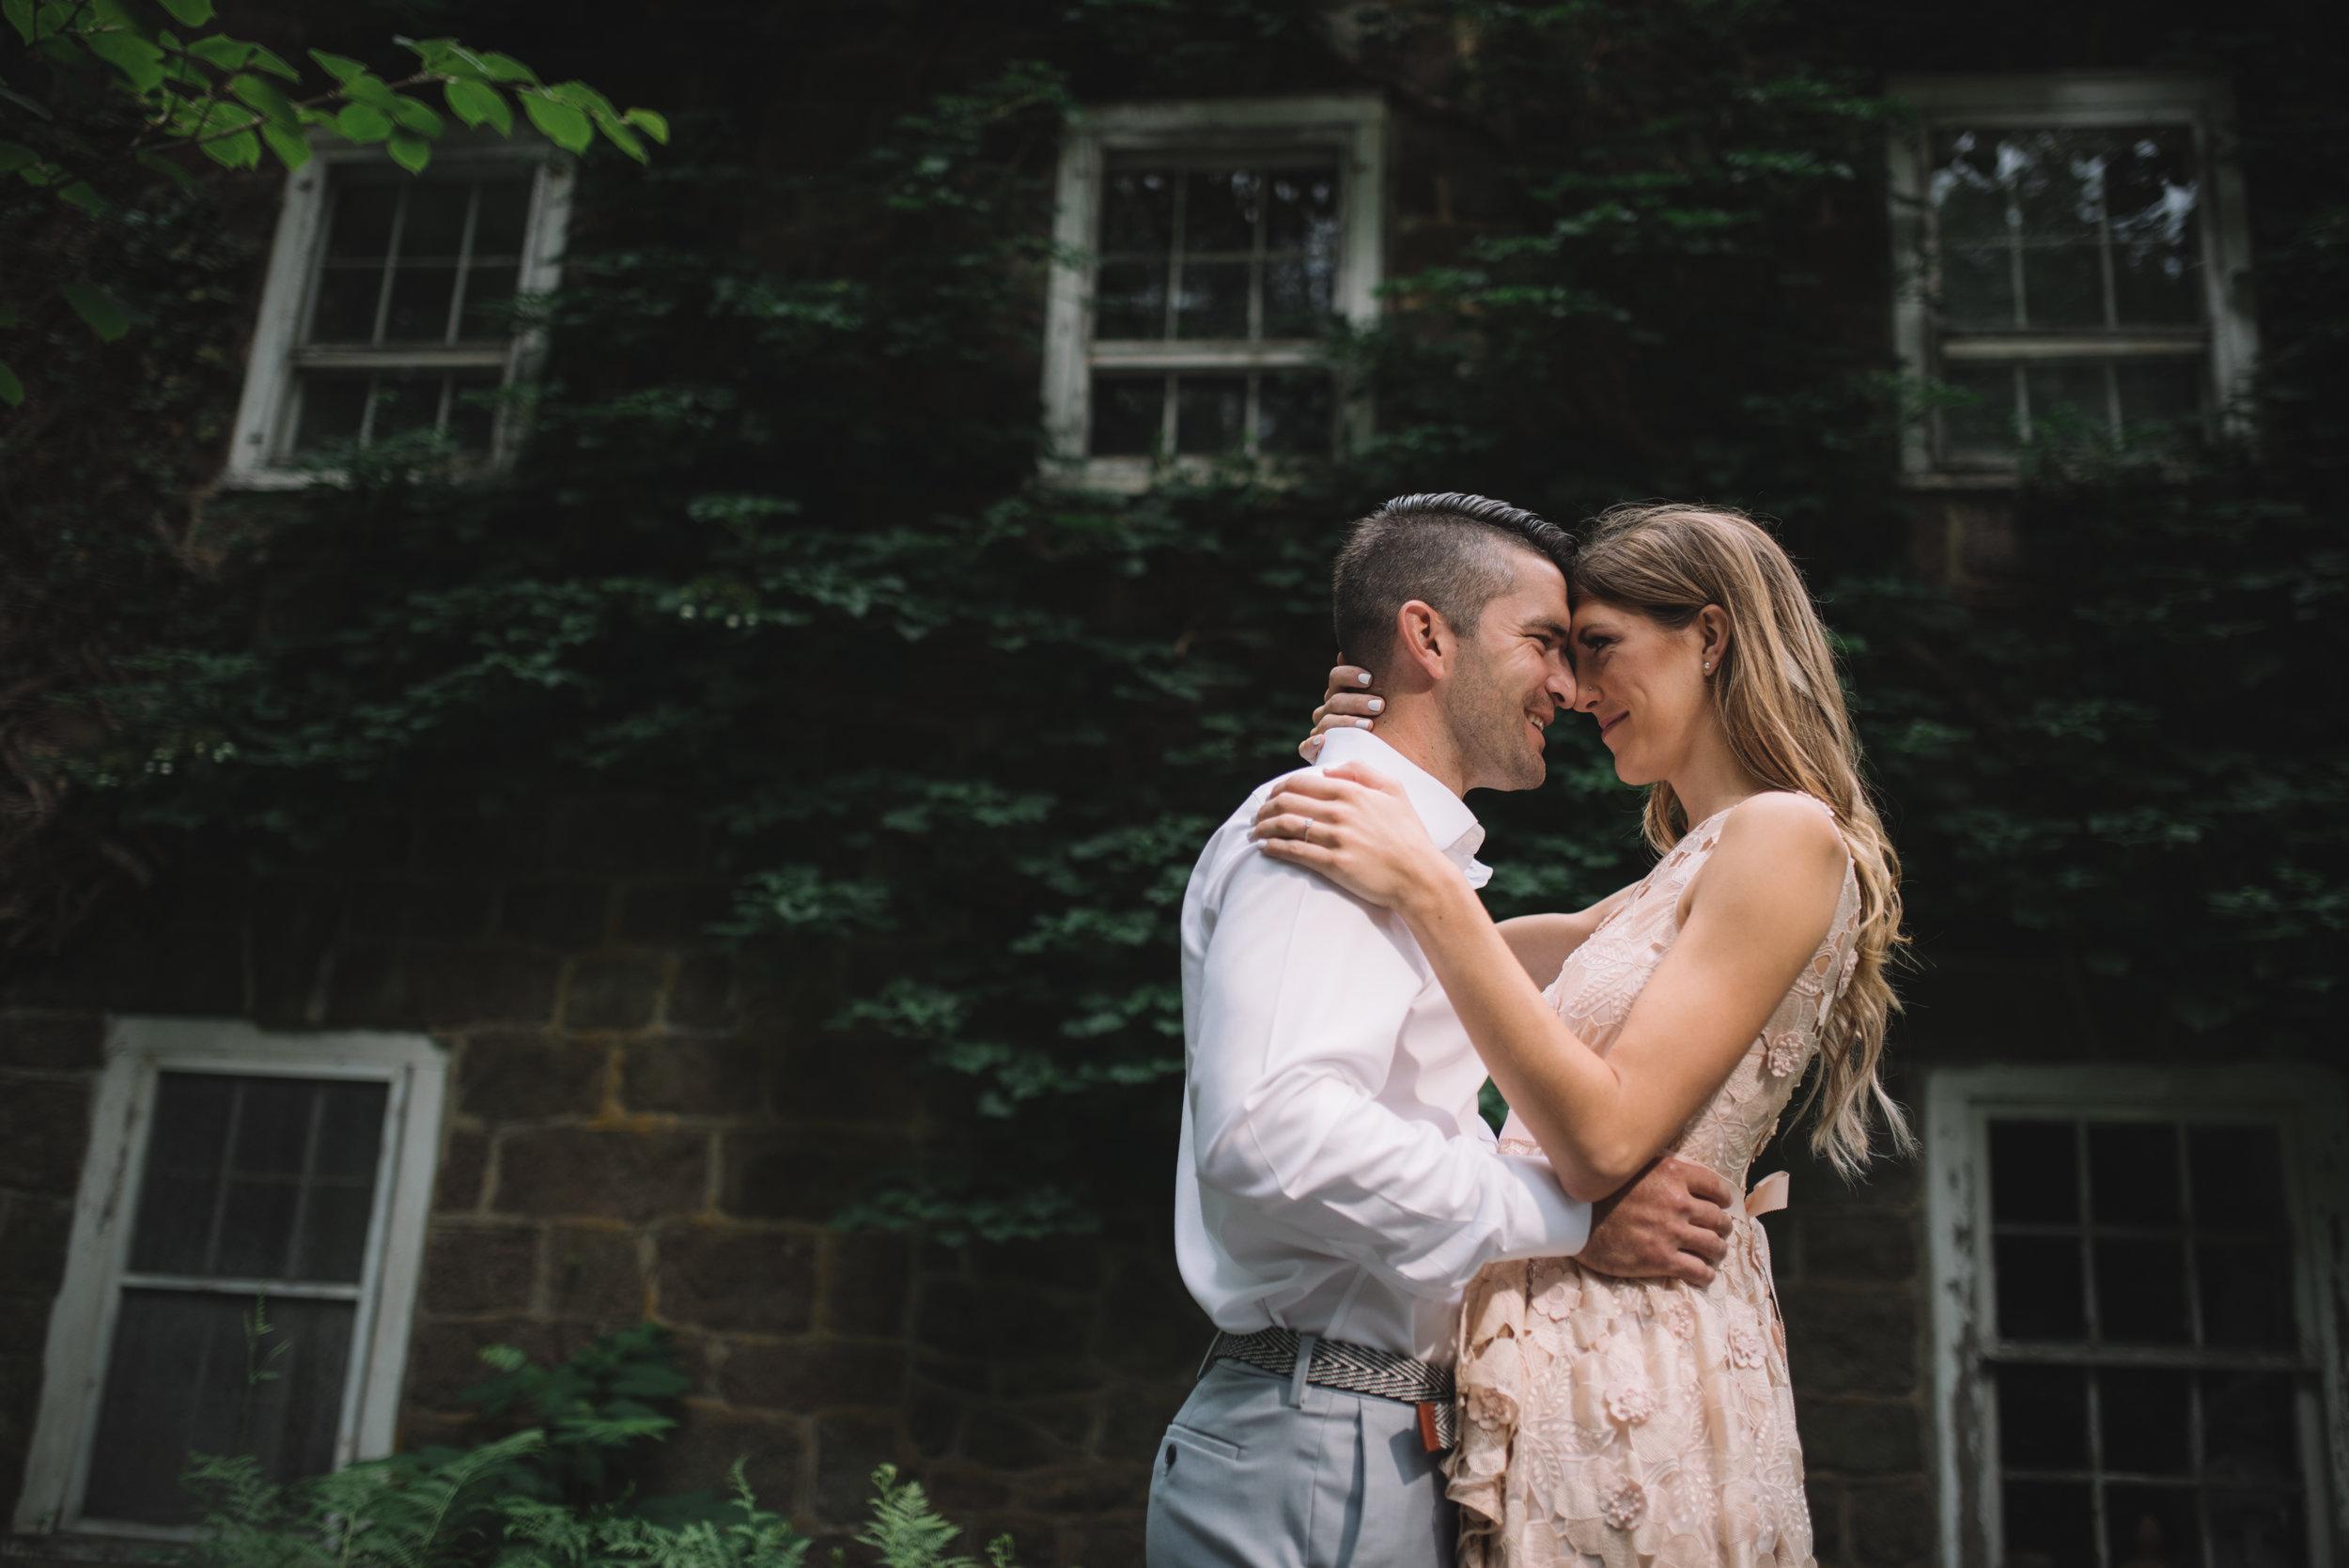 WeddingPhotos | NJPhotographer | Highlights-4-9.jpg